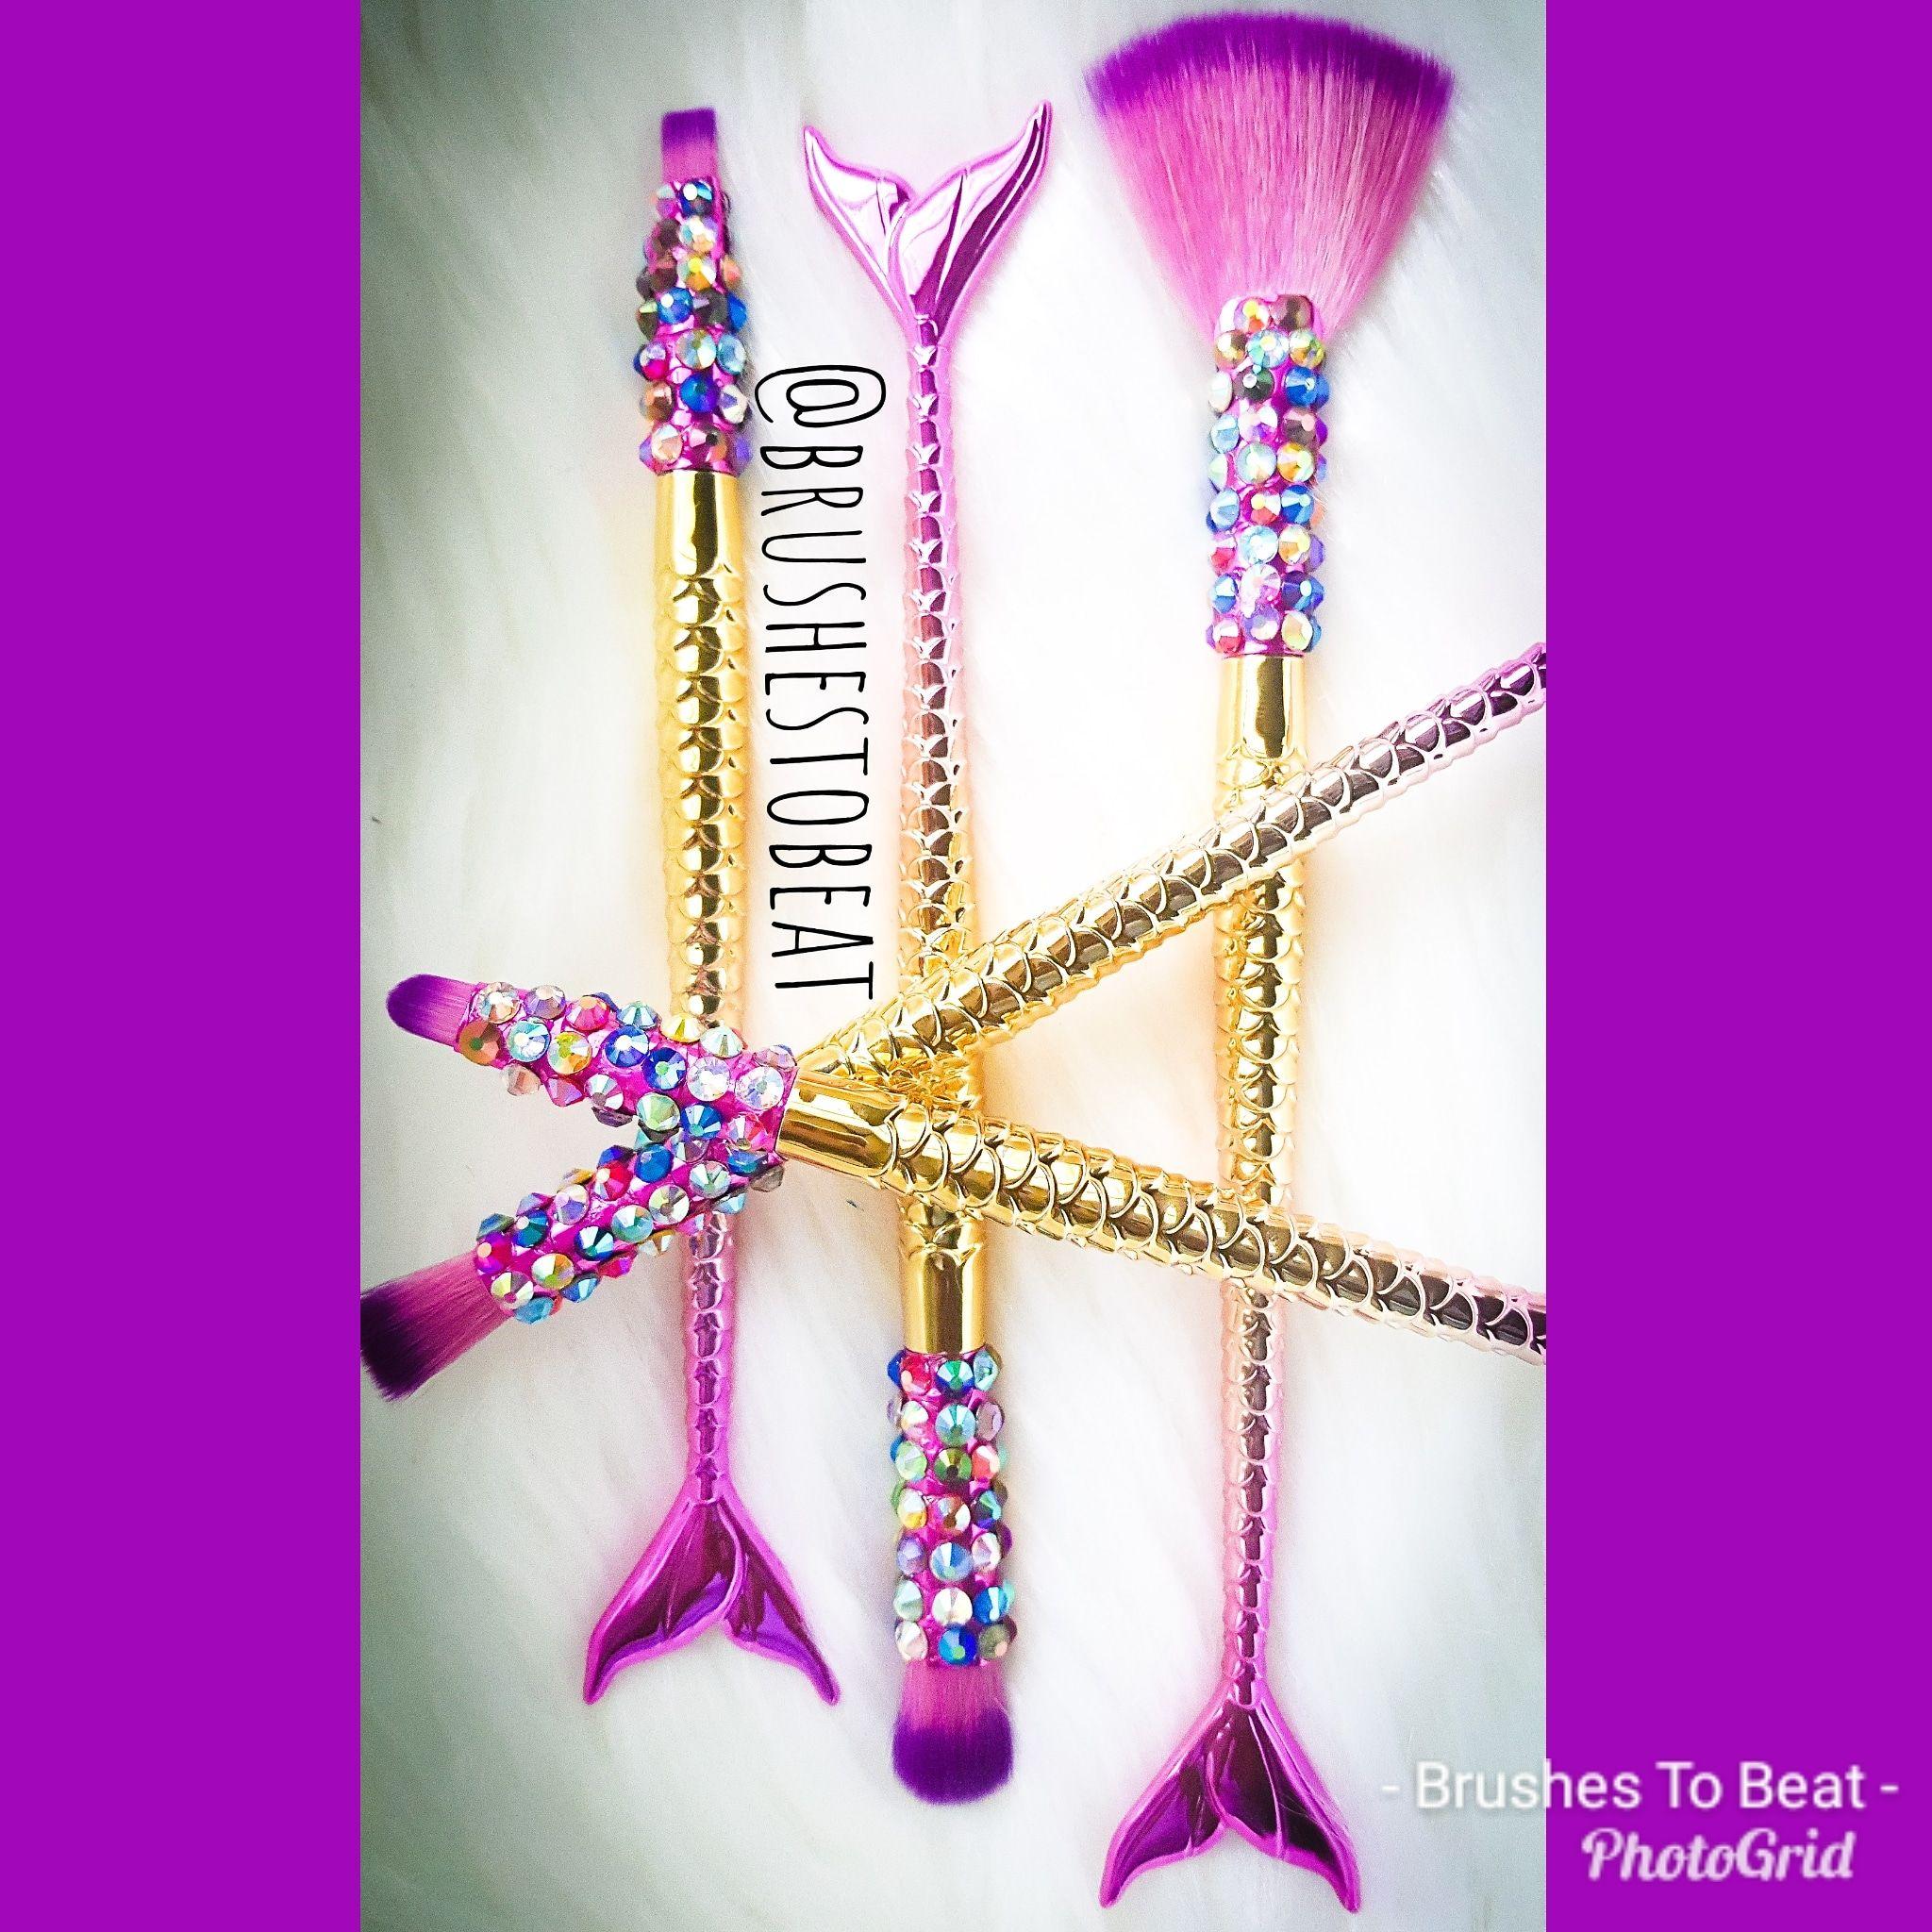 Rainbow Crystal Pink & Gold Mermaid Tail 5 piece Makeup